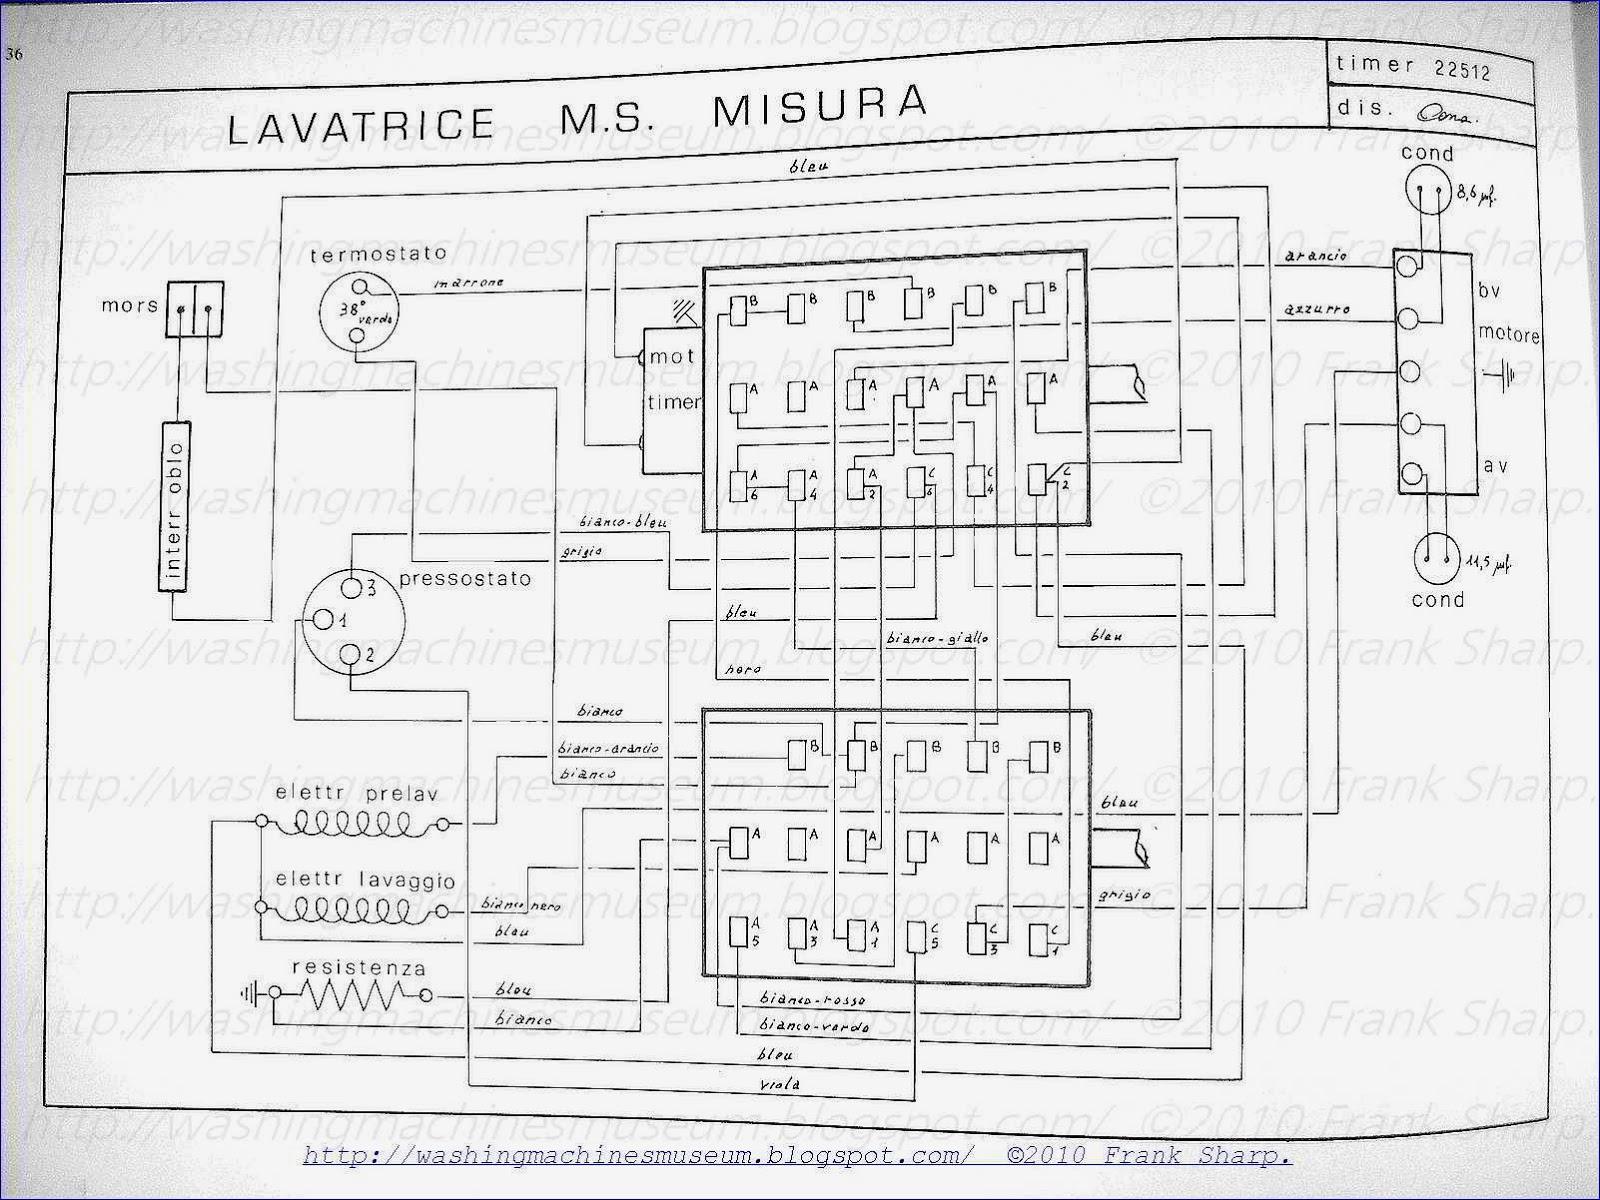 Washer Rama Museum.: CANDY M.S. MISURA TIMER 22512